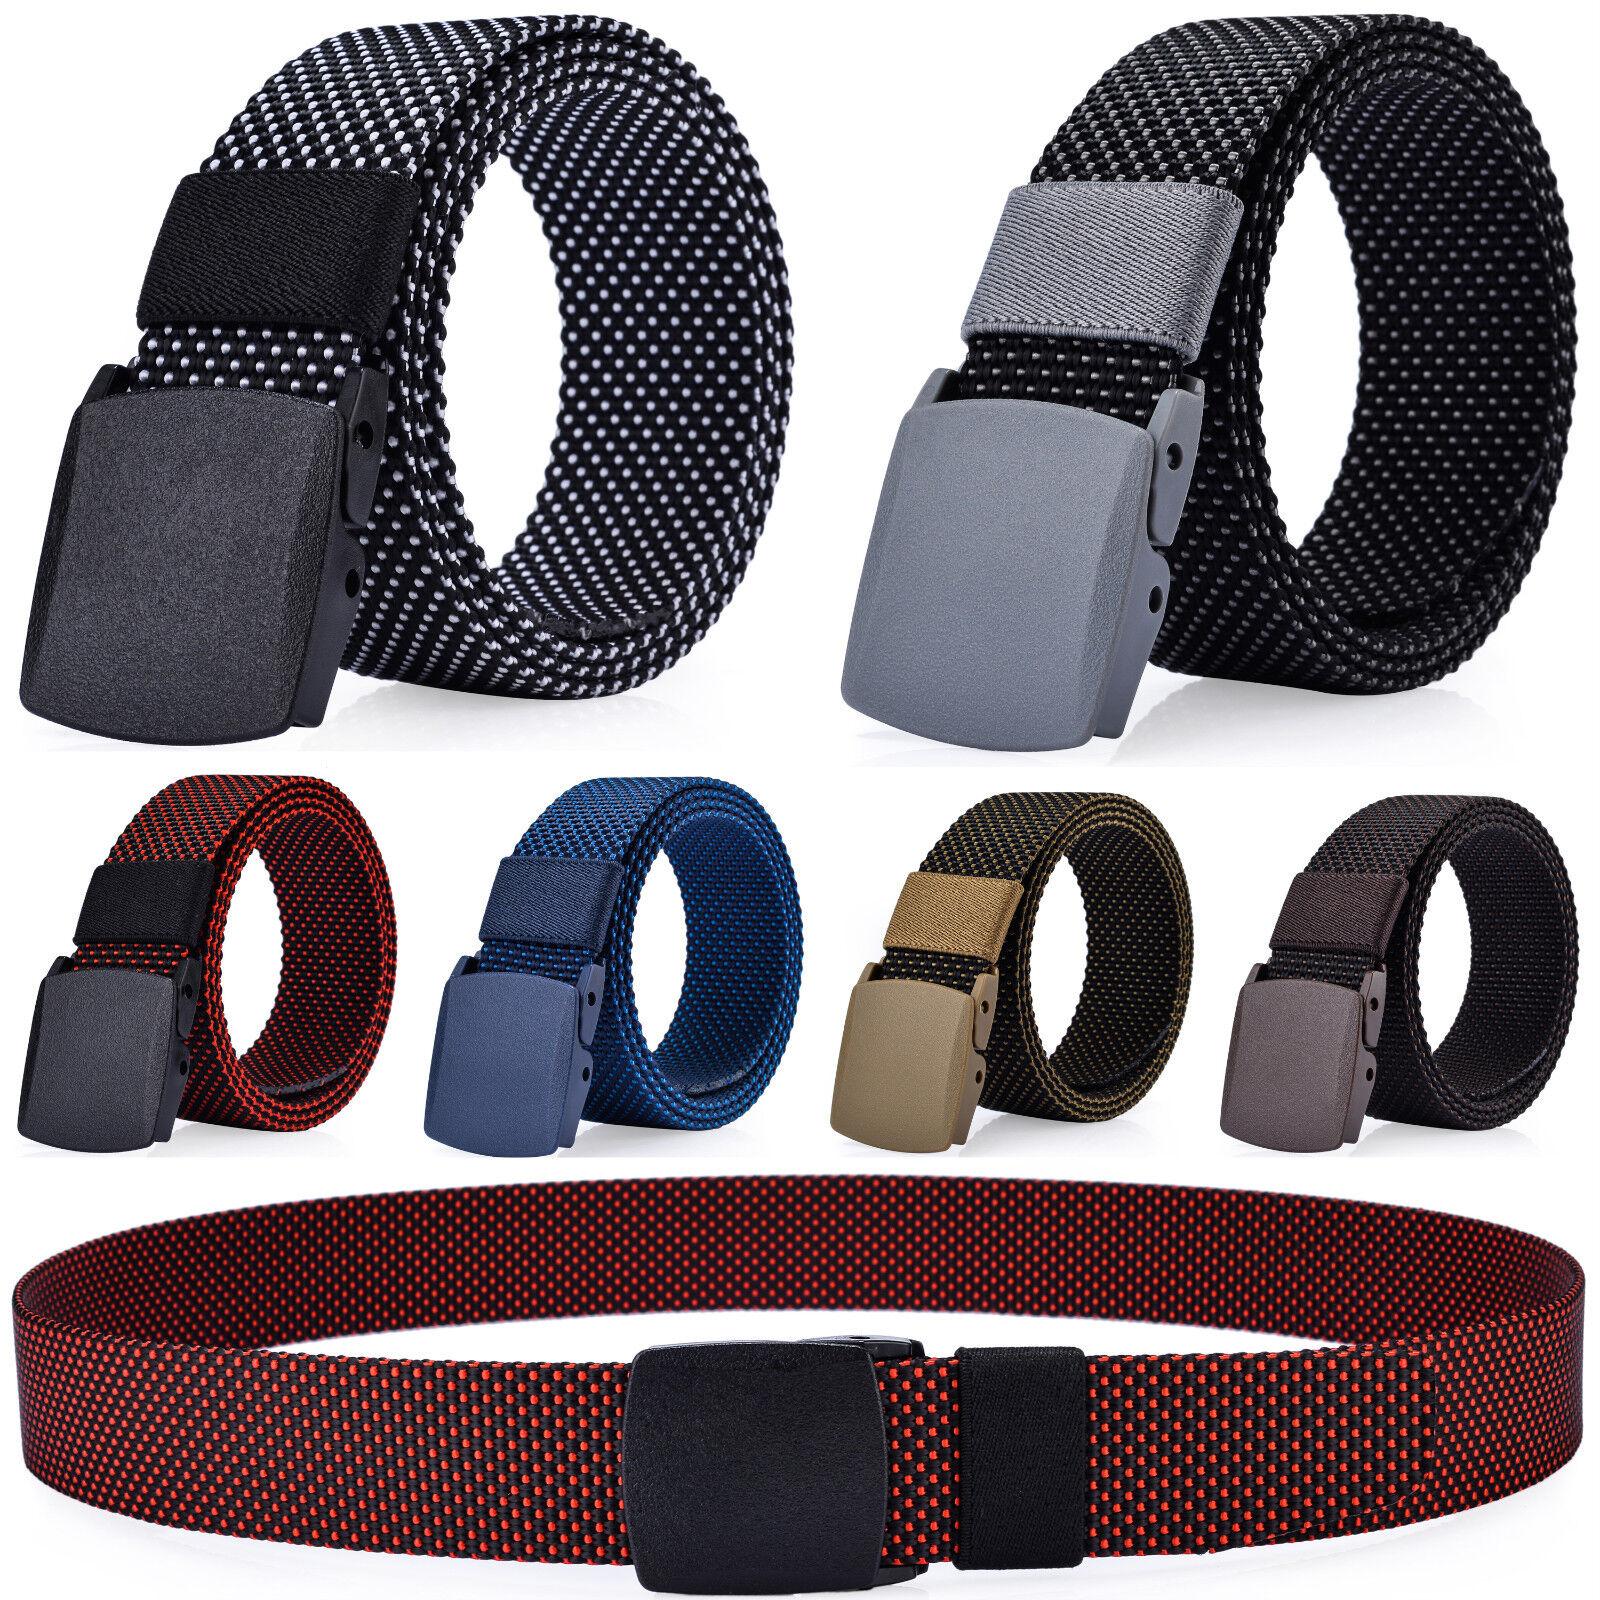 Men's Casual Dress Belt, Nylon Webbed Belt, Plastic Buckle, No Metal Parts Belts